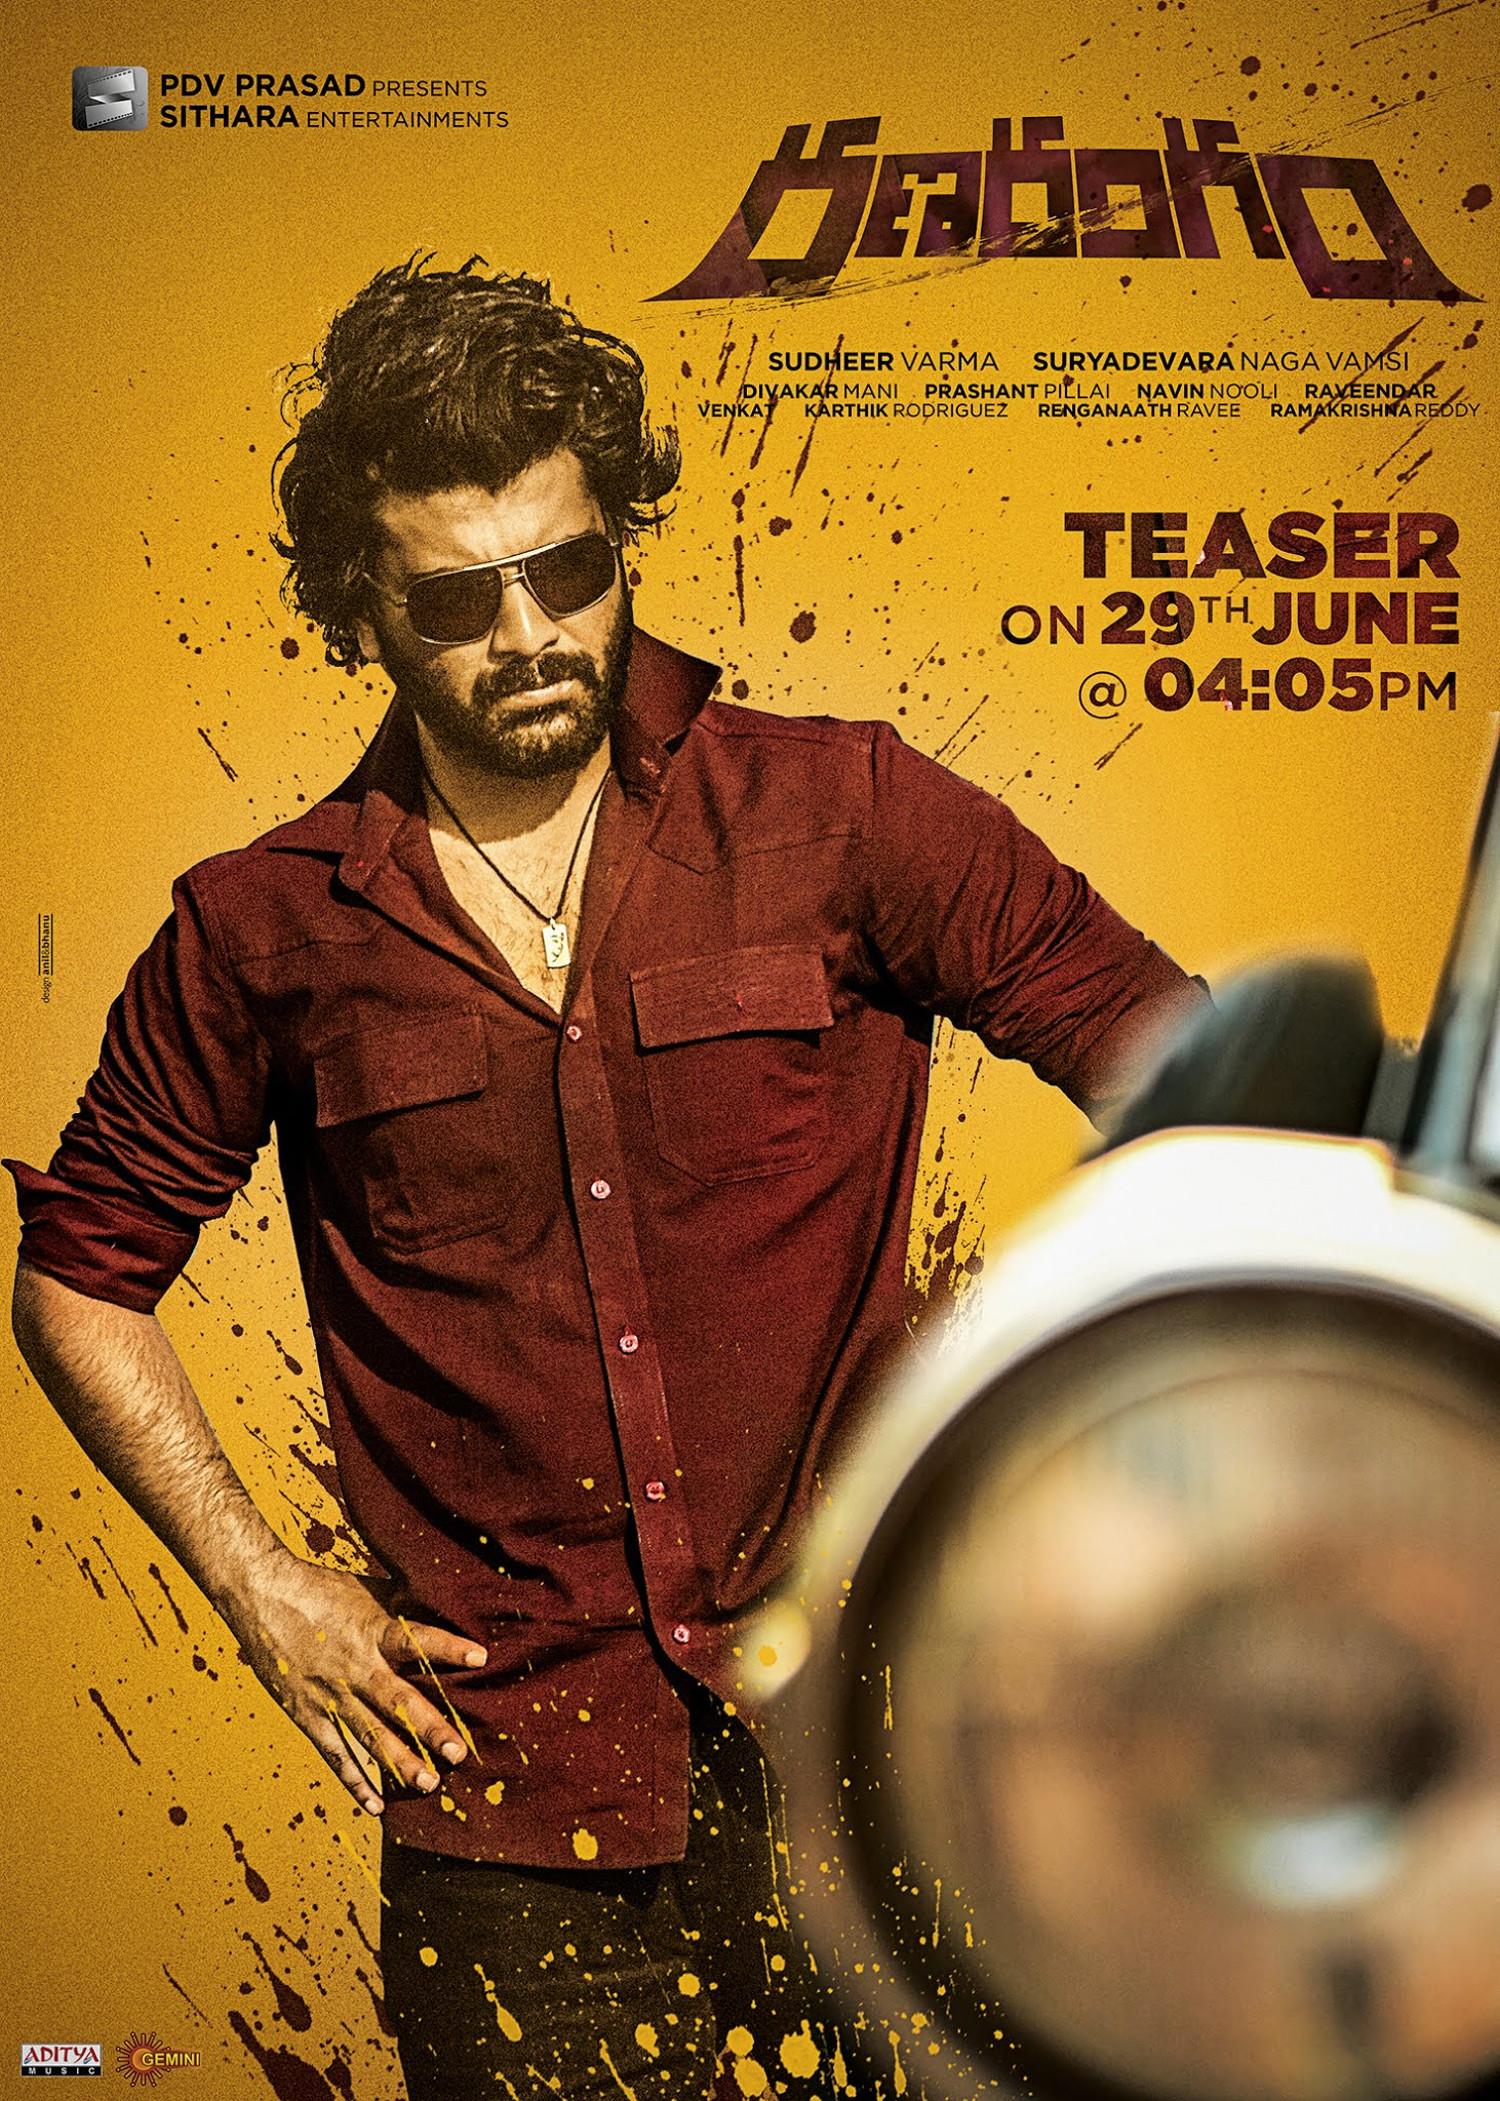 Sharwanand Ranarangam Movie Teaser on 29th June Poster HD